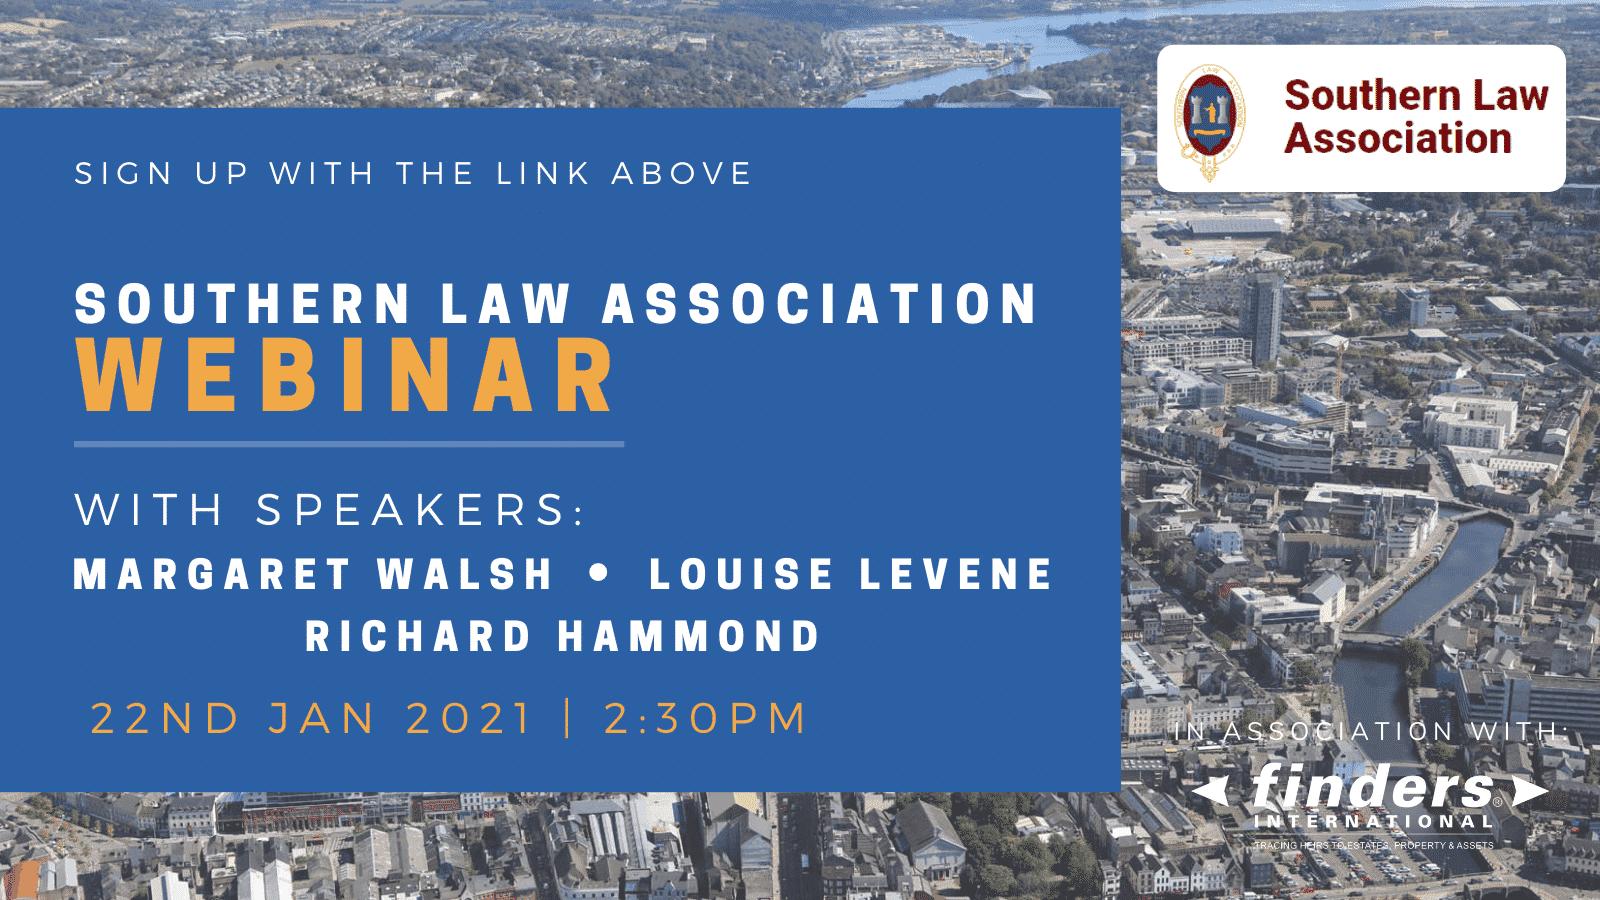 Southern Law Association Webinar